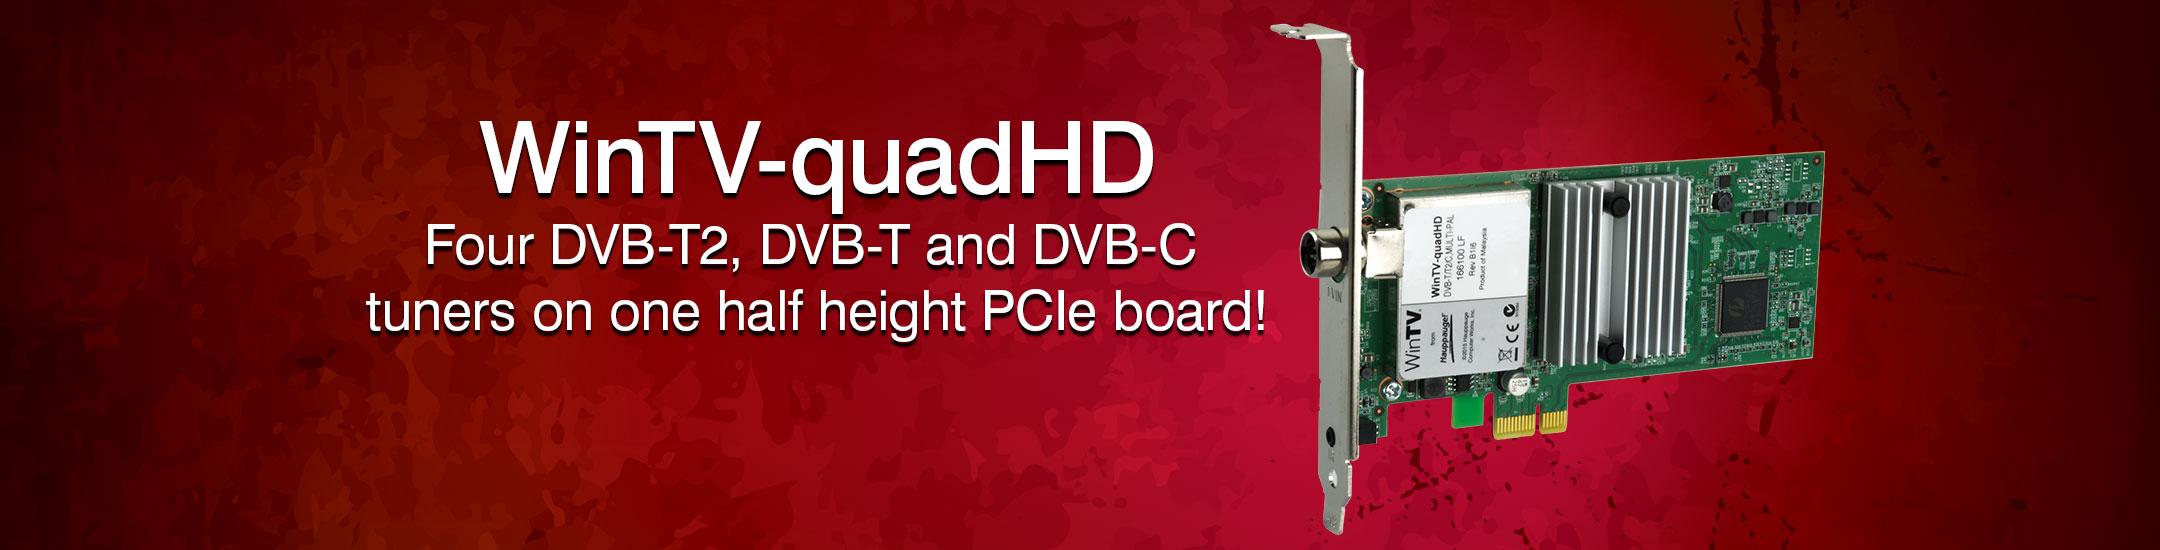 WinTV-quadHD